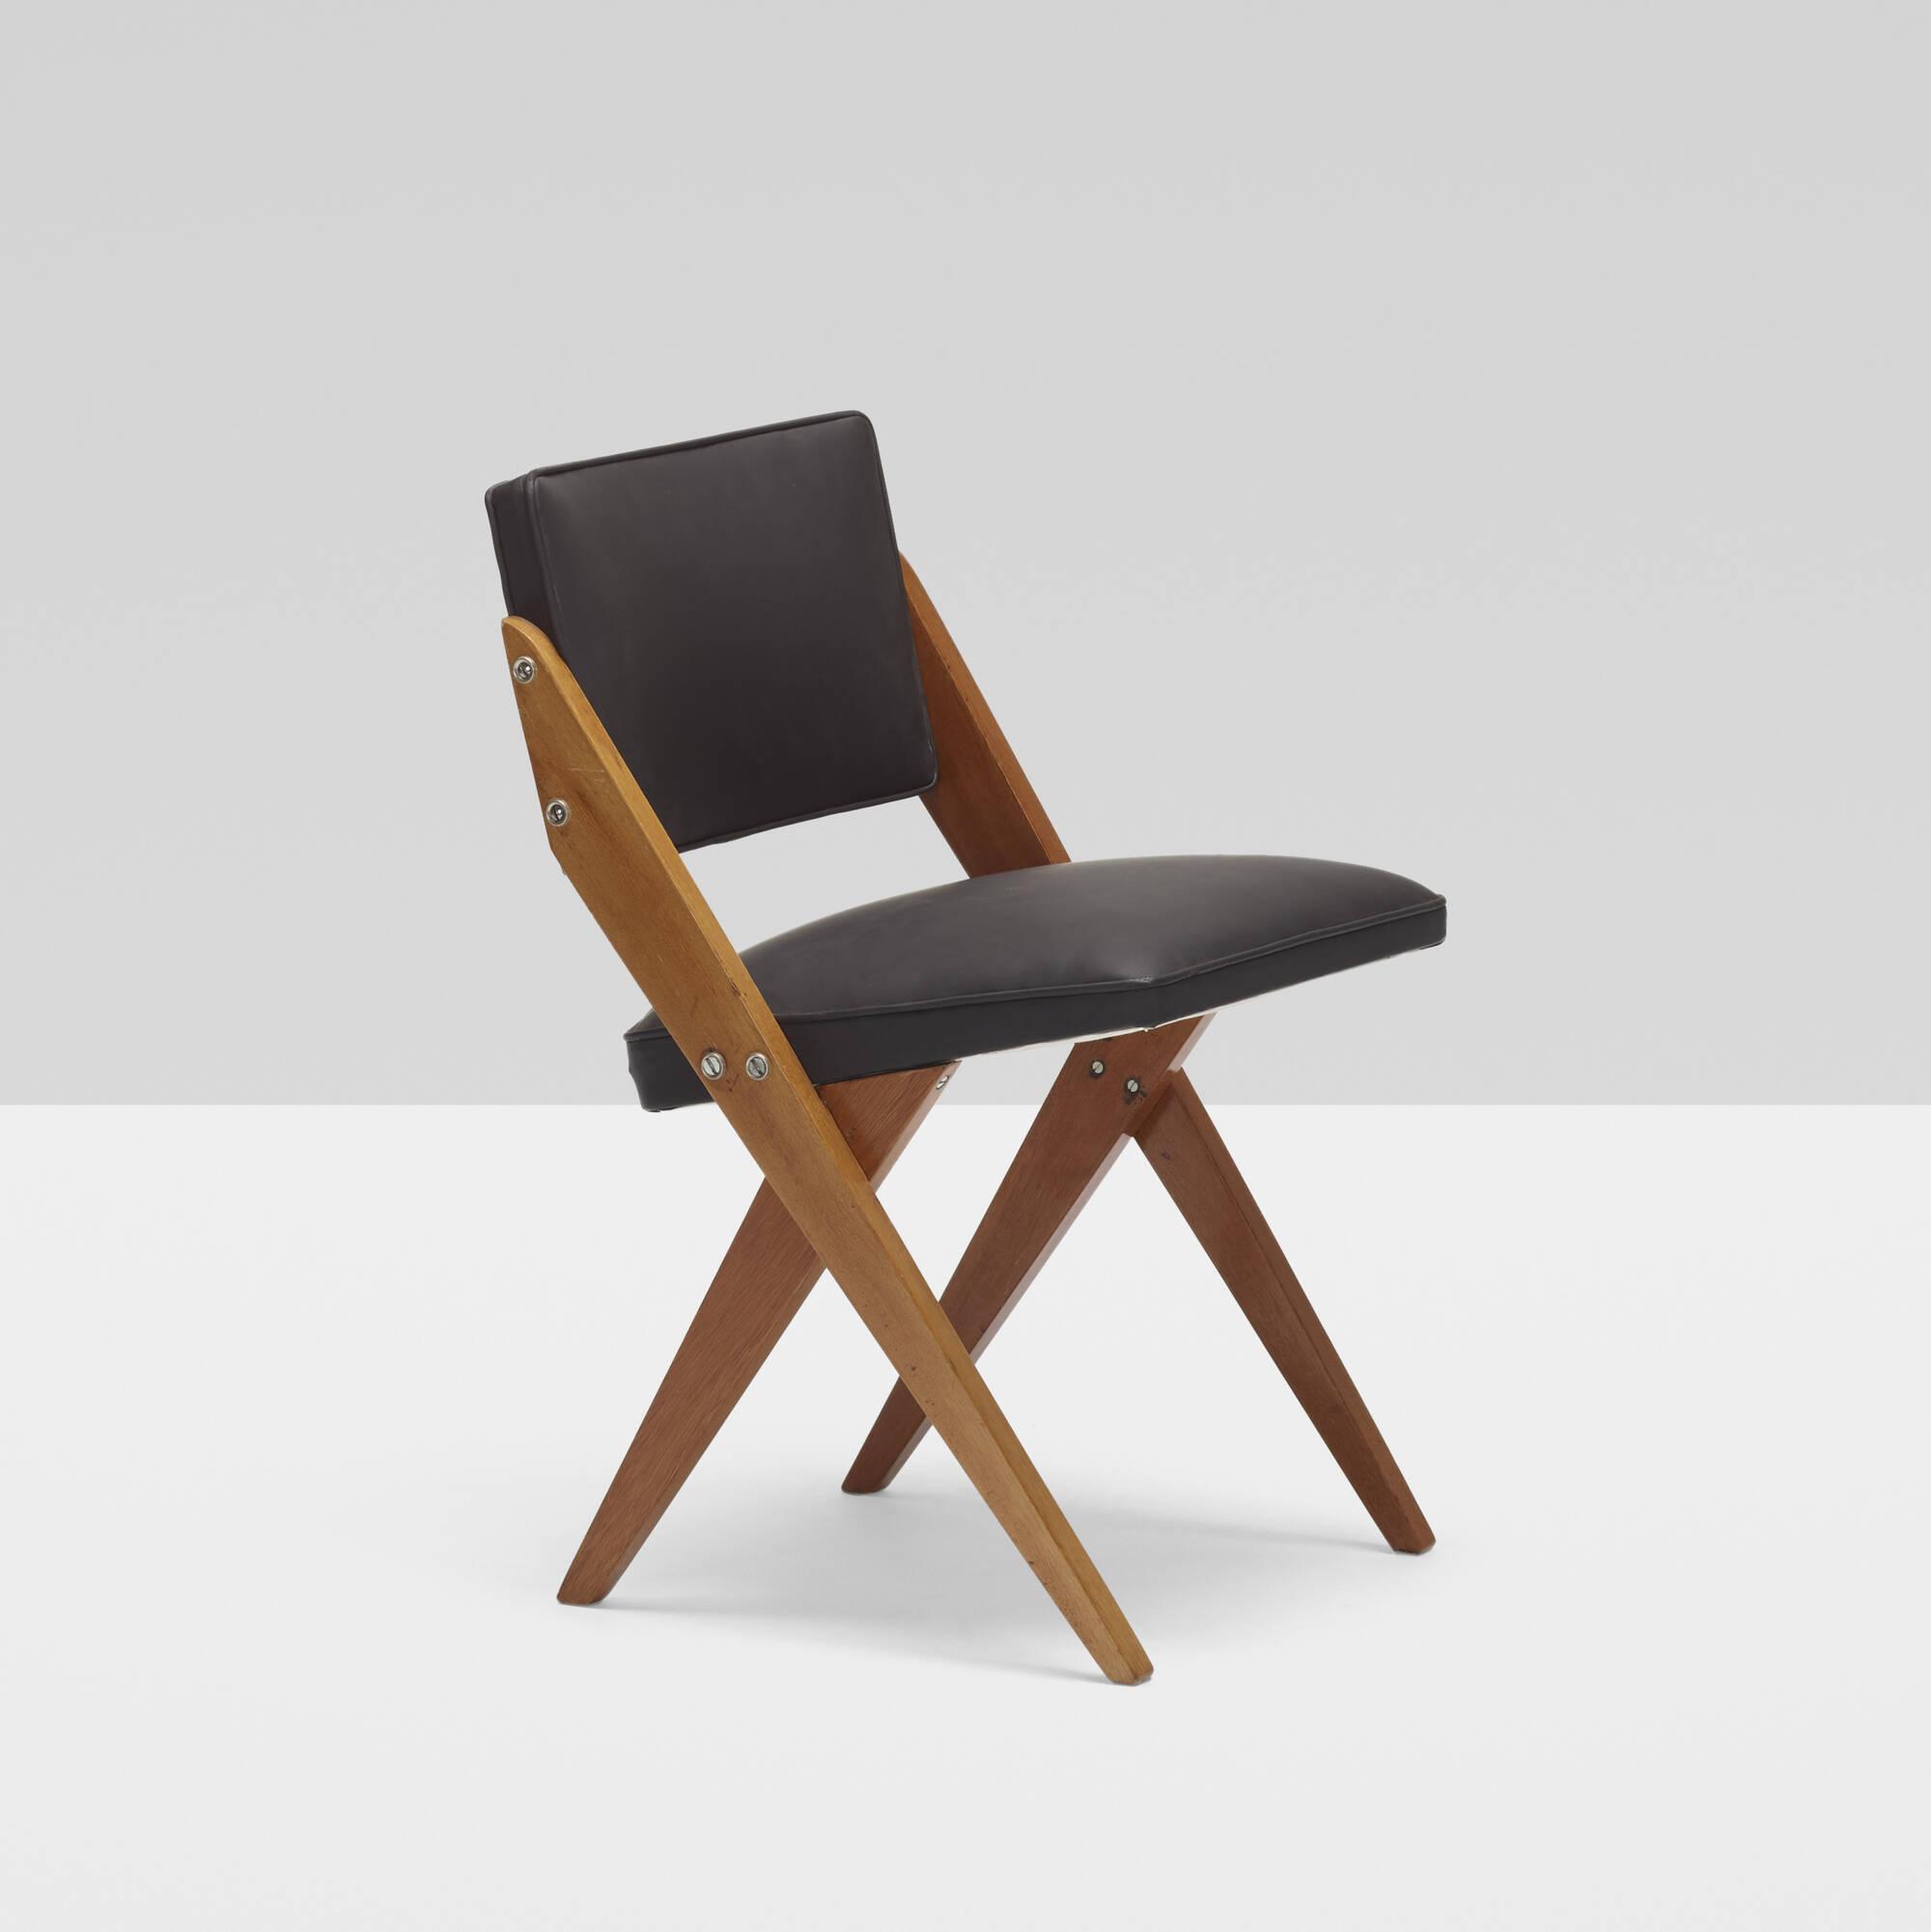 170: José Zanine Caldas / chair (1 of 2)